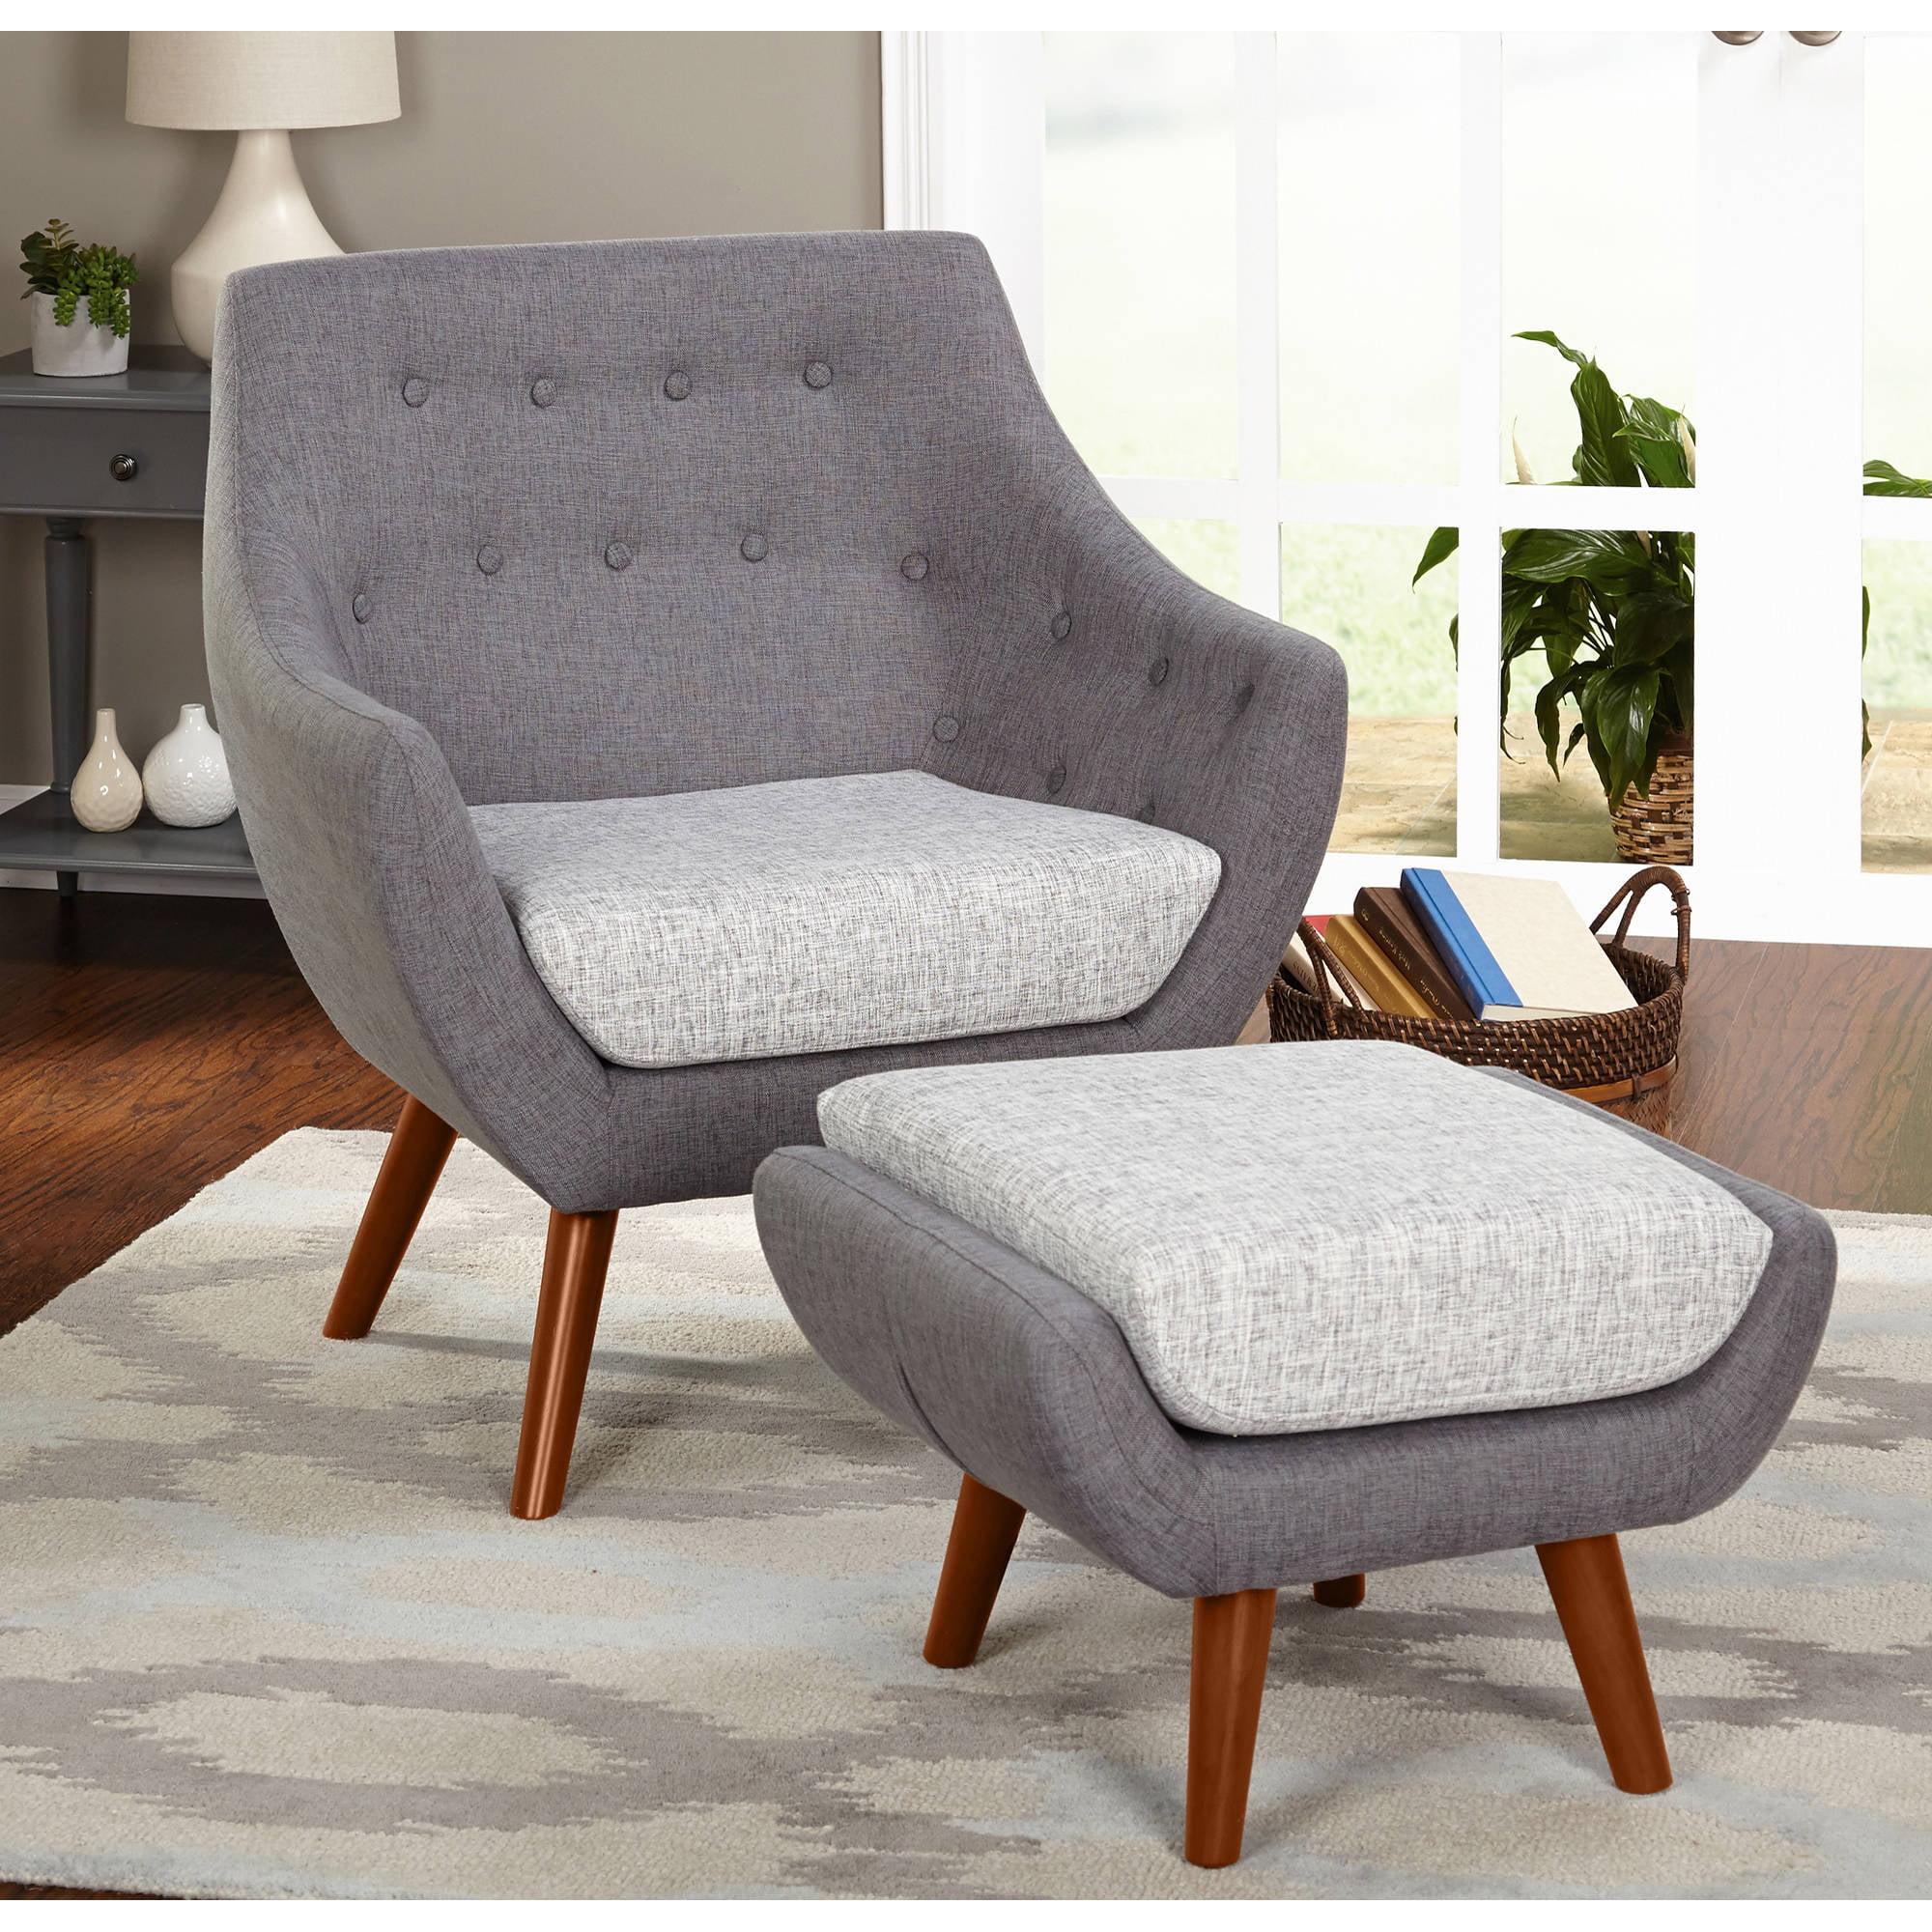 Awesome Elijah Chair And Ottoman Set Walmart Com Andrewgaddart Wooden Chair Designs For Living Room Andrewgaddartcom